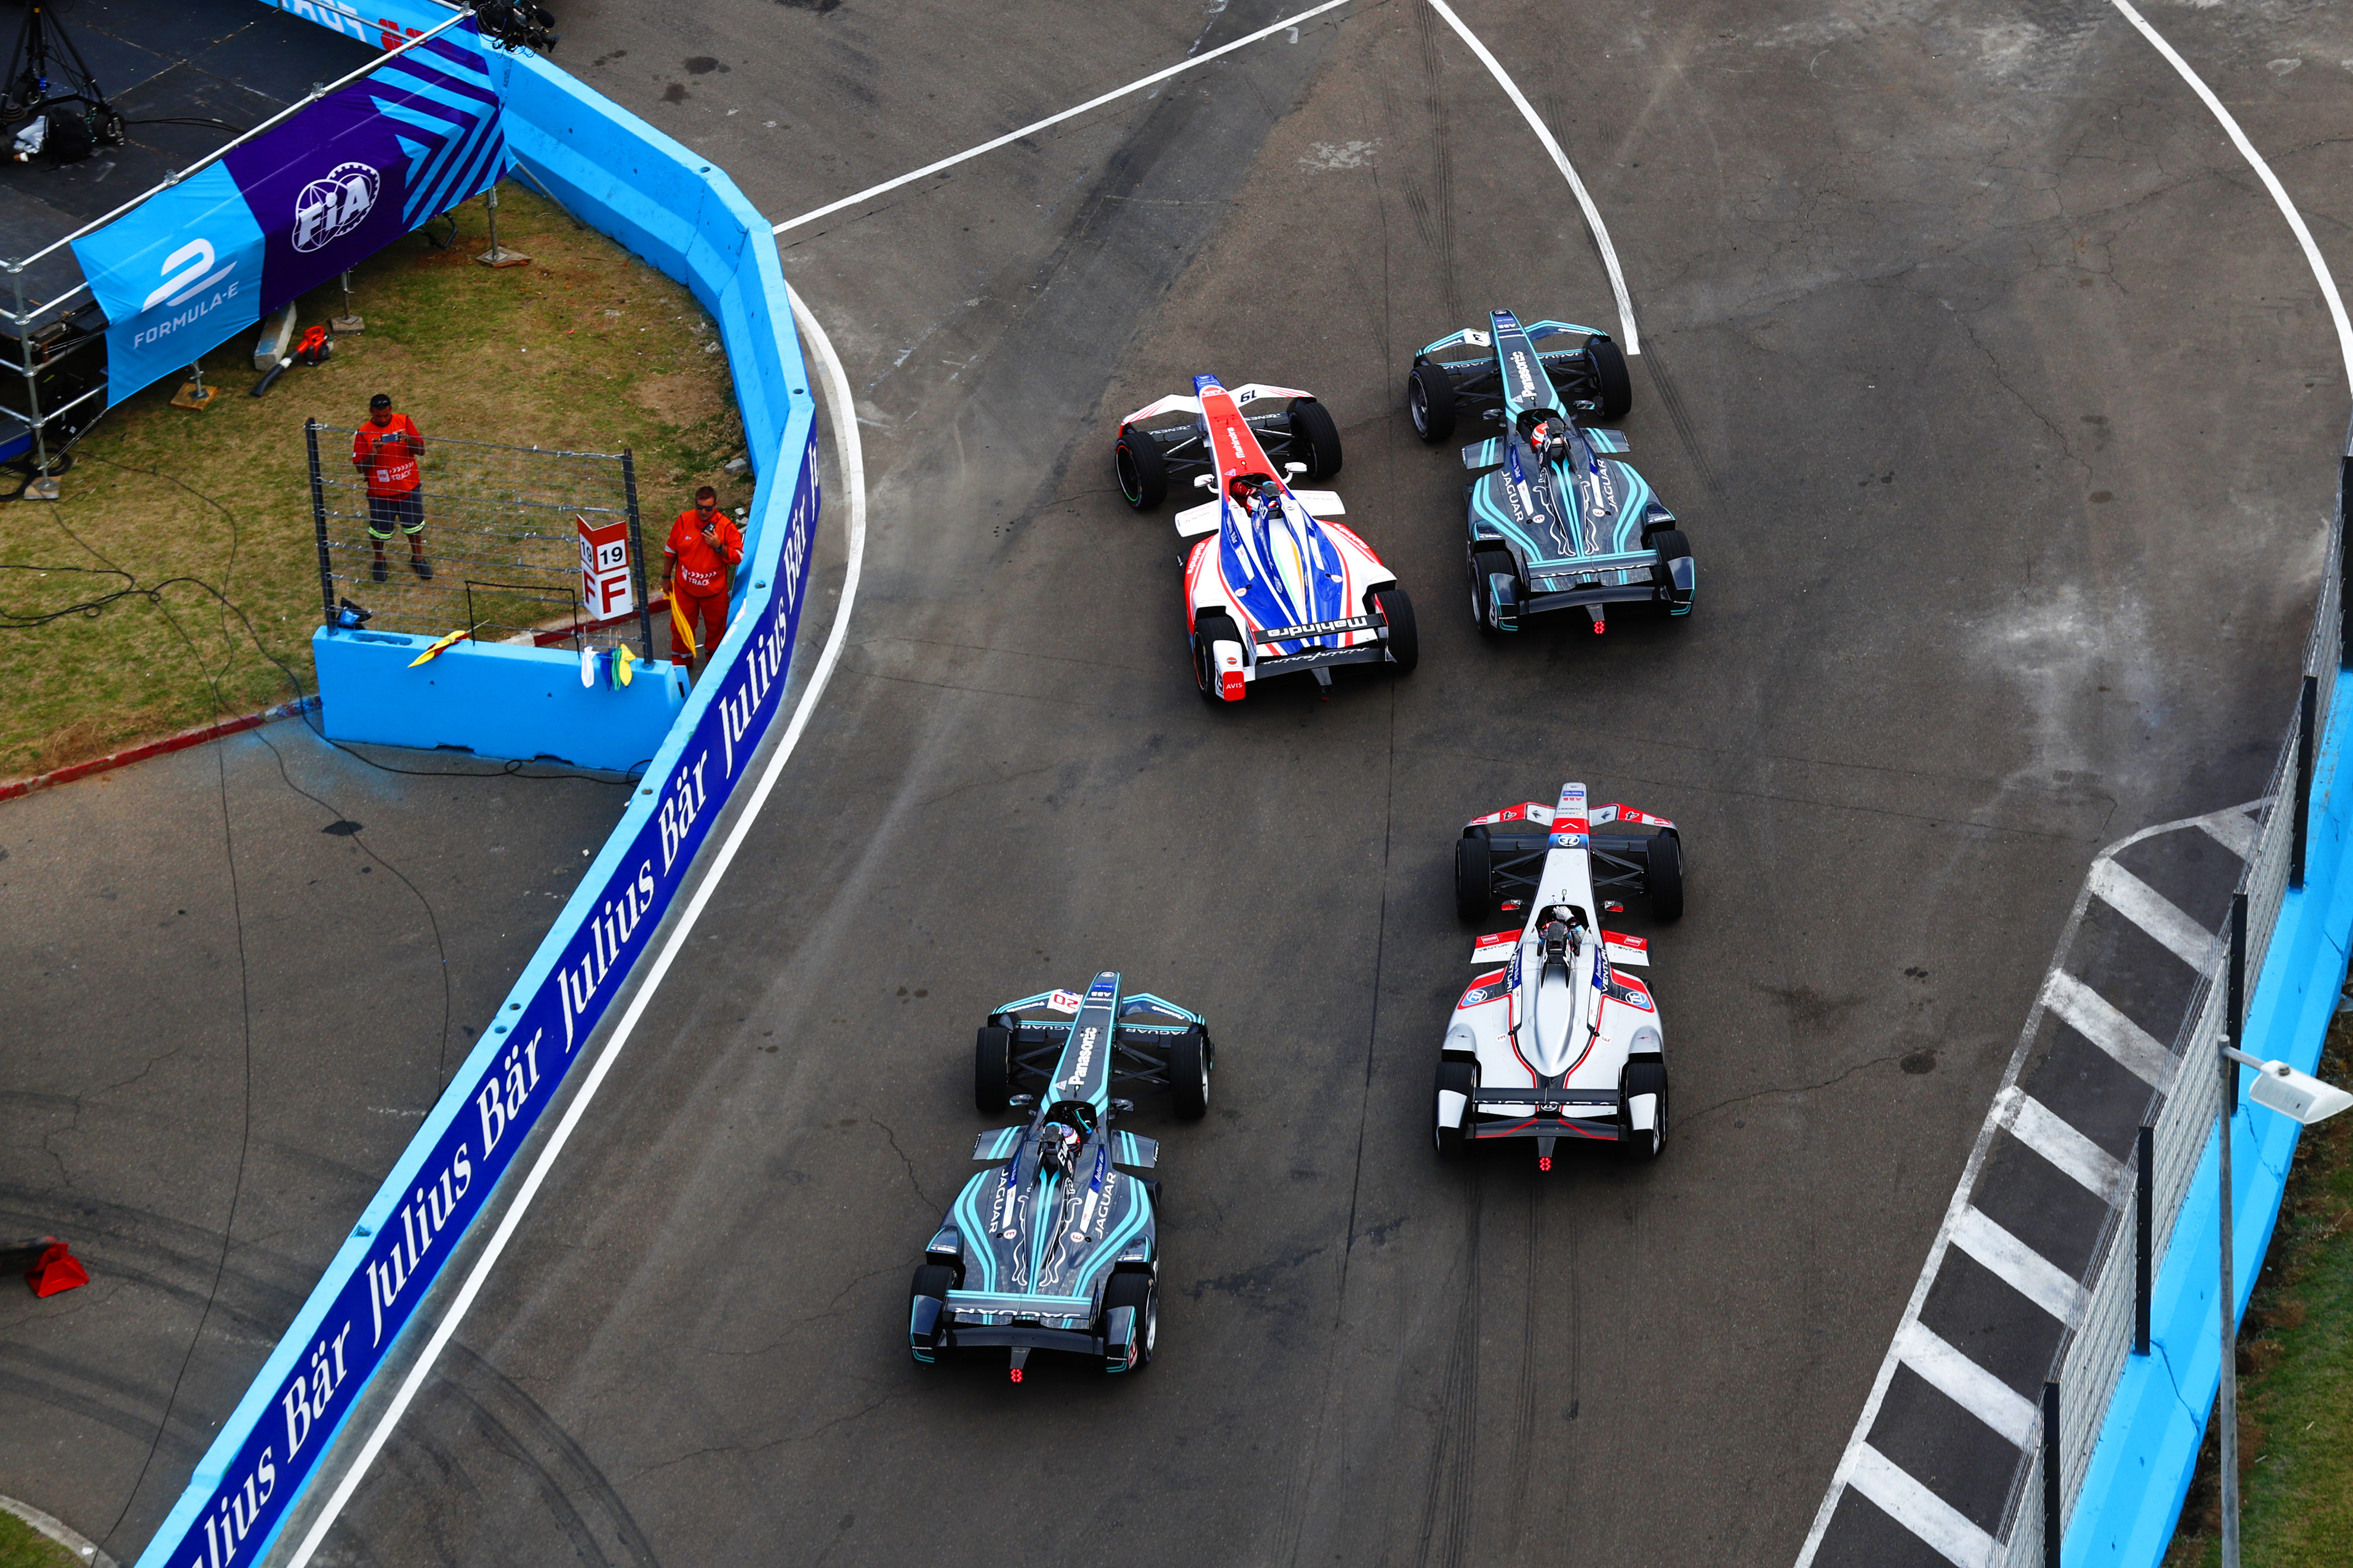 Felix Rosenqvist (SWE), Mahindra Racing, Mahindra M4Electro, Nelson Piquet Jr. (BRA), Panasonic Jaguar Racing, Jaguar I-Type II,Mitch Evans (NZL), Panasonic Jaguar Racing, Jaguar I-Type II, and Maro Engel (GER), Venturi Formula E, Venturi VM200-FE-03.